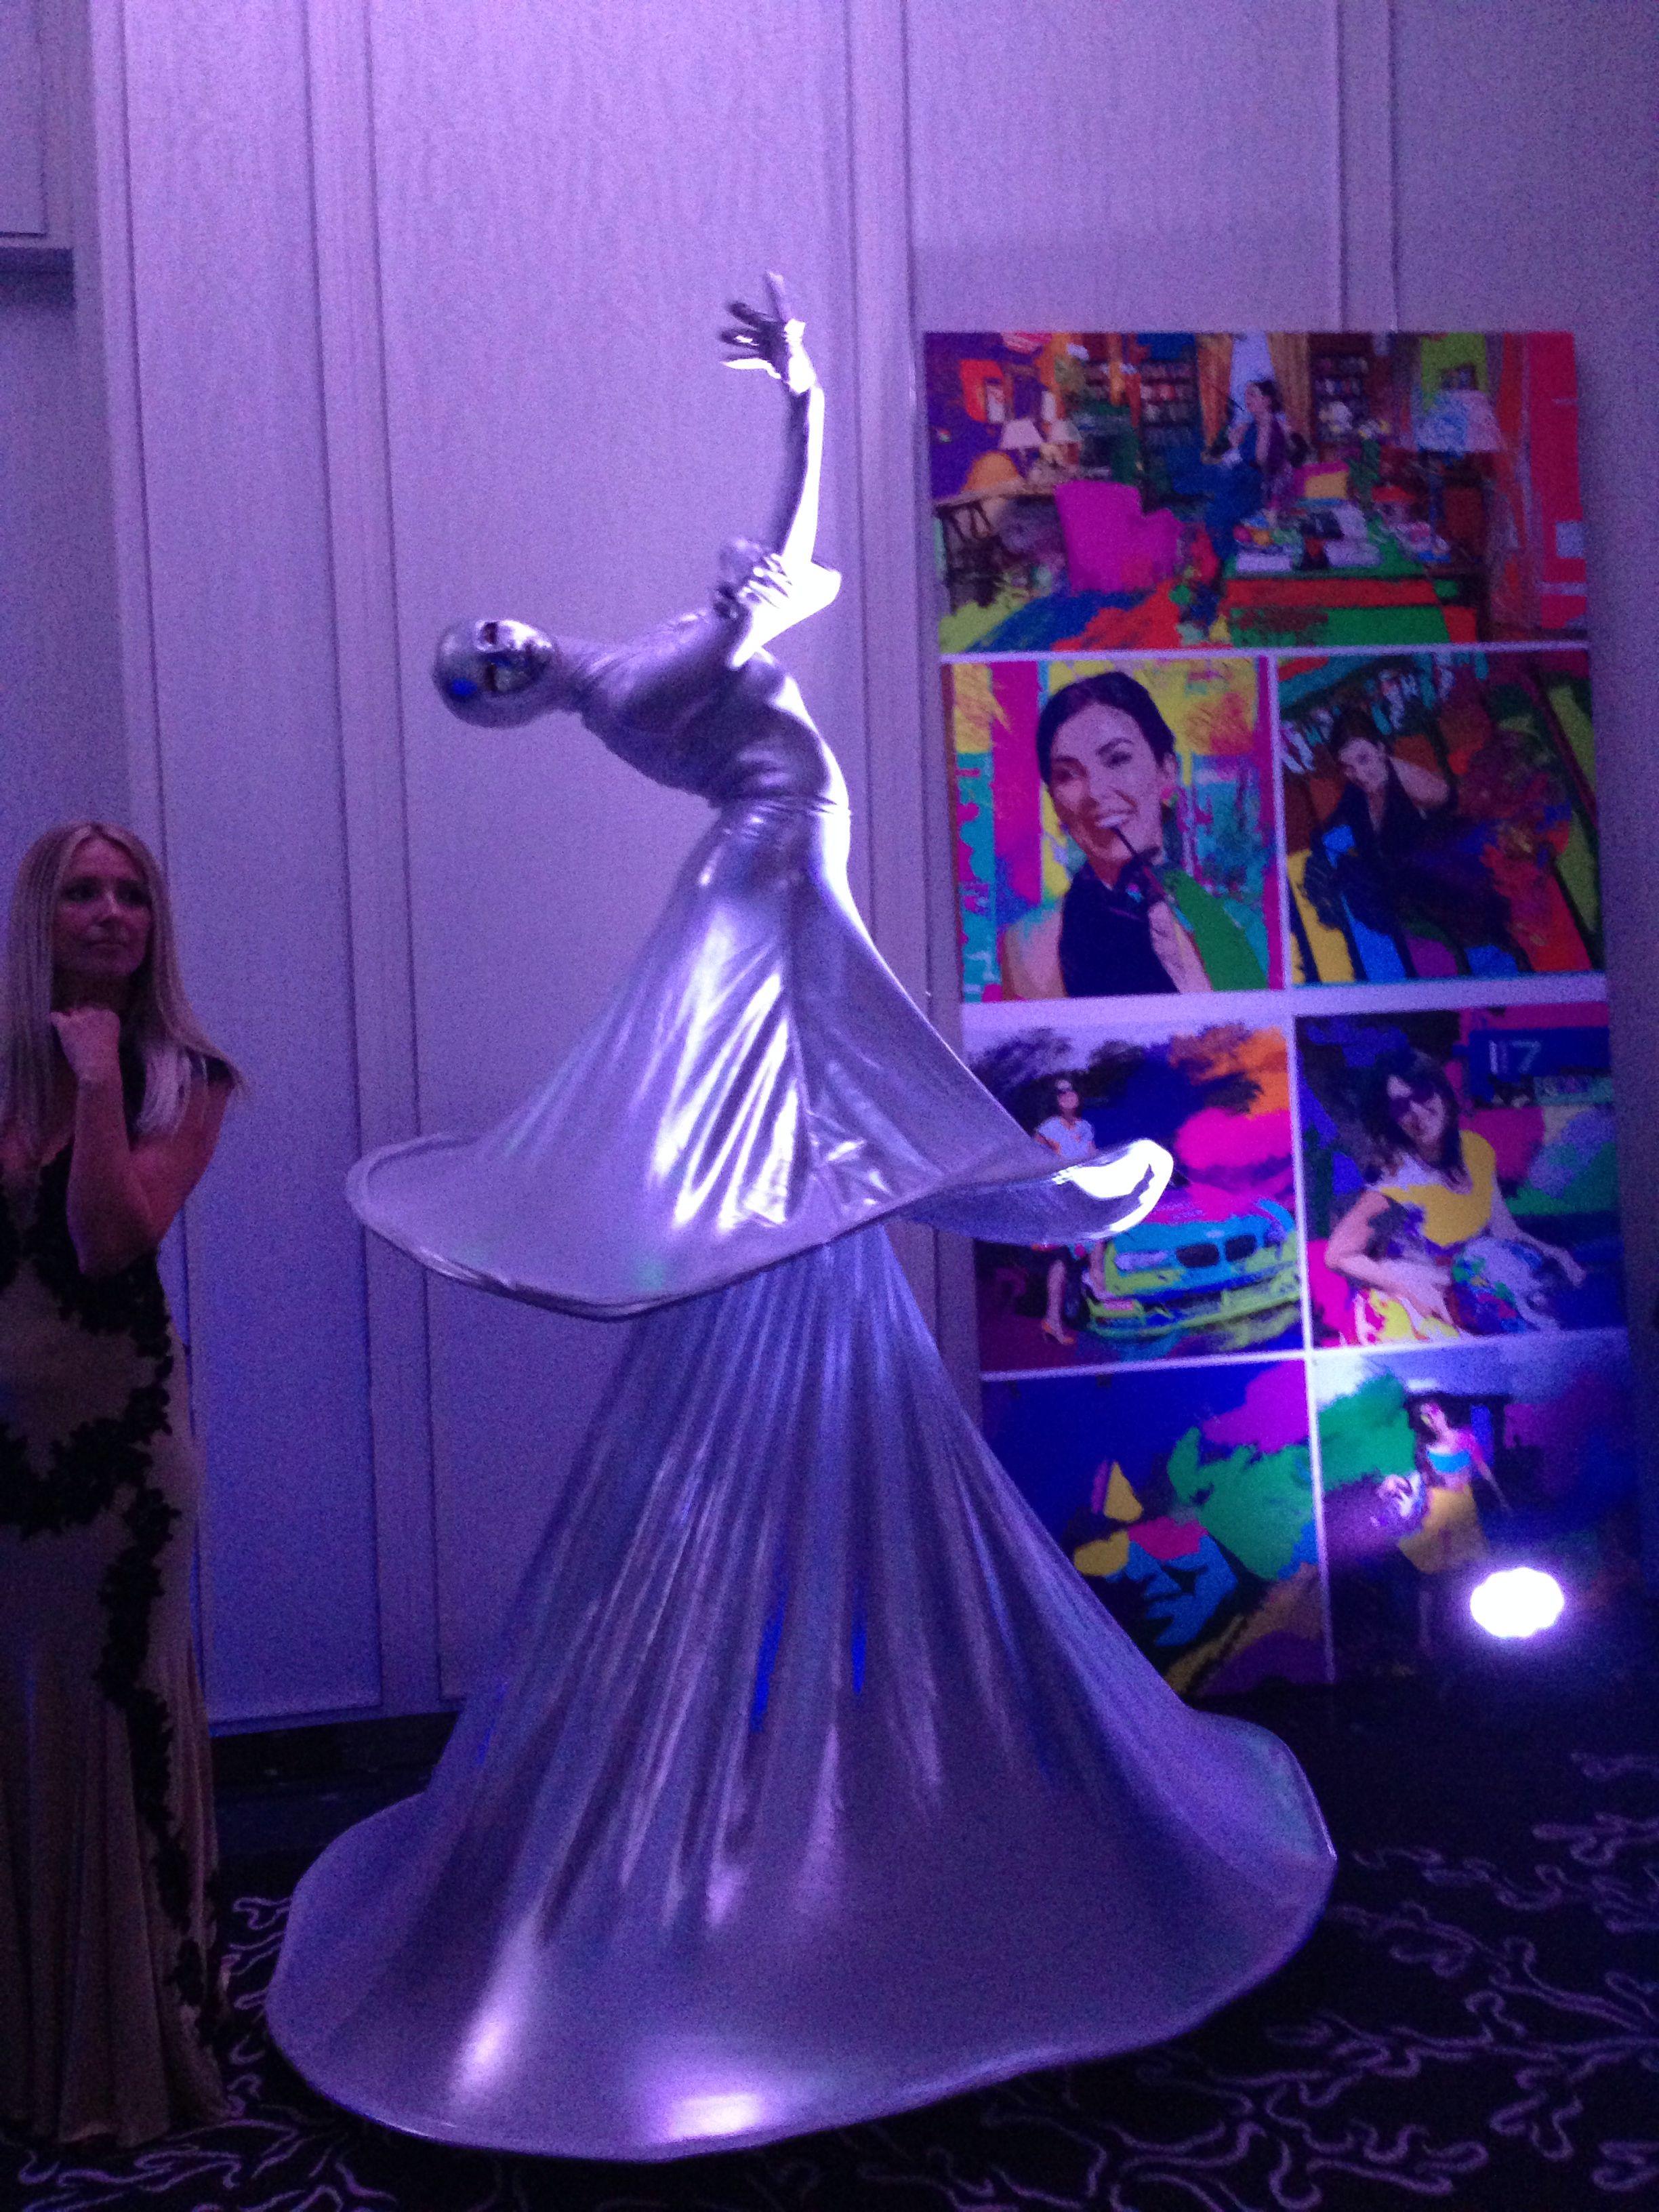 Living statue | St Regis Bal Harbour Resort, Florida Events ...